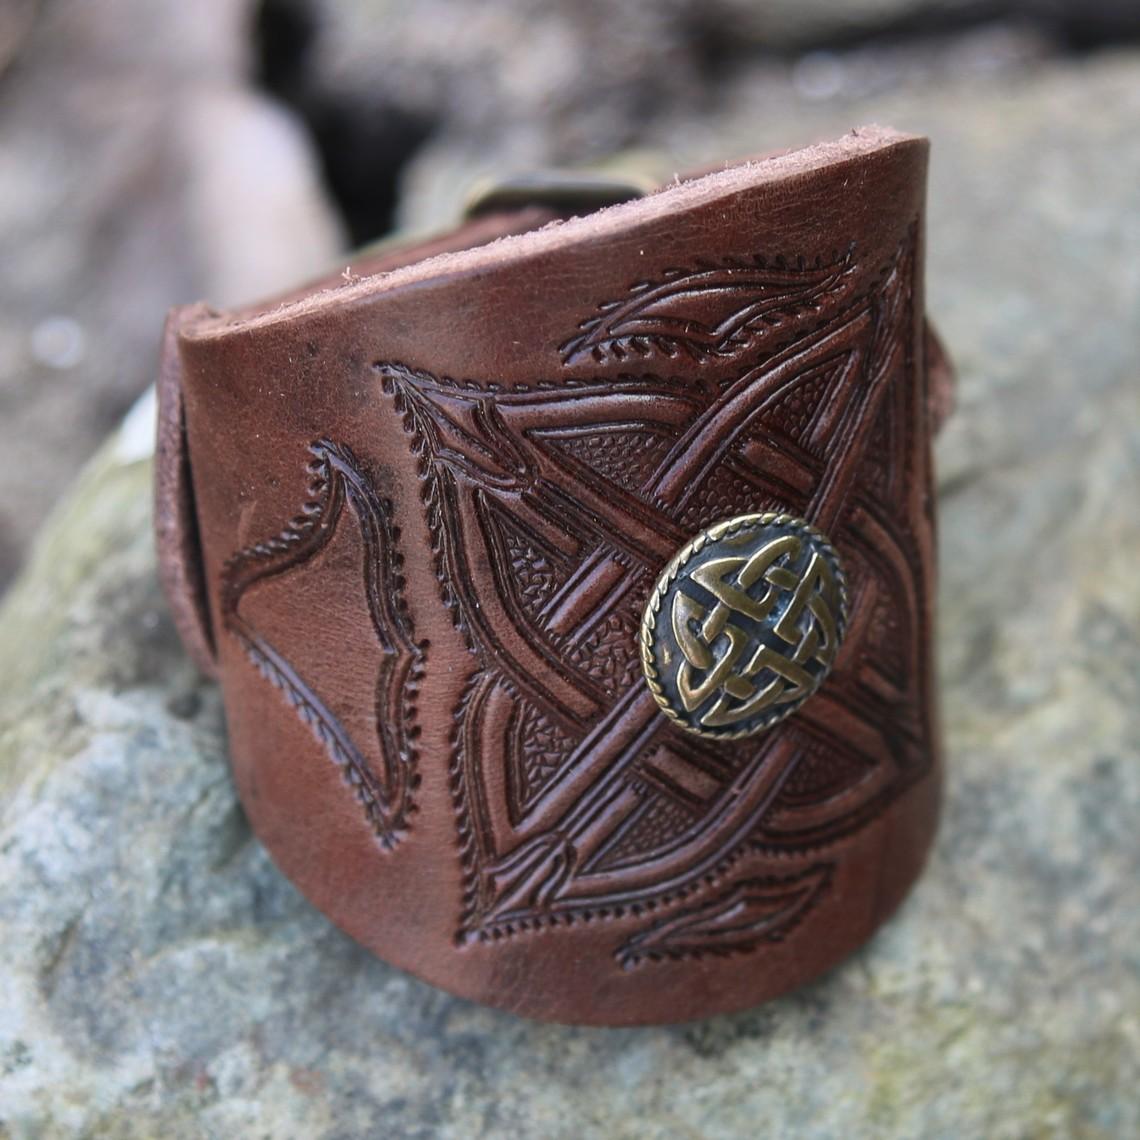 Celtic Lederarmband mit Schnallen, braun